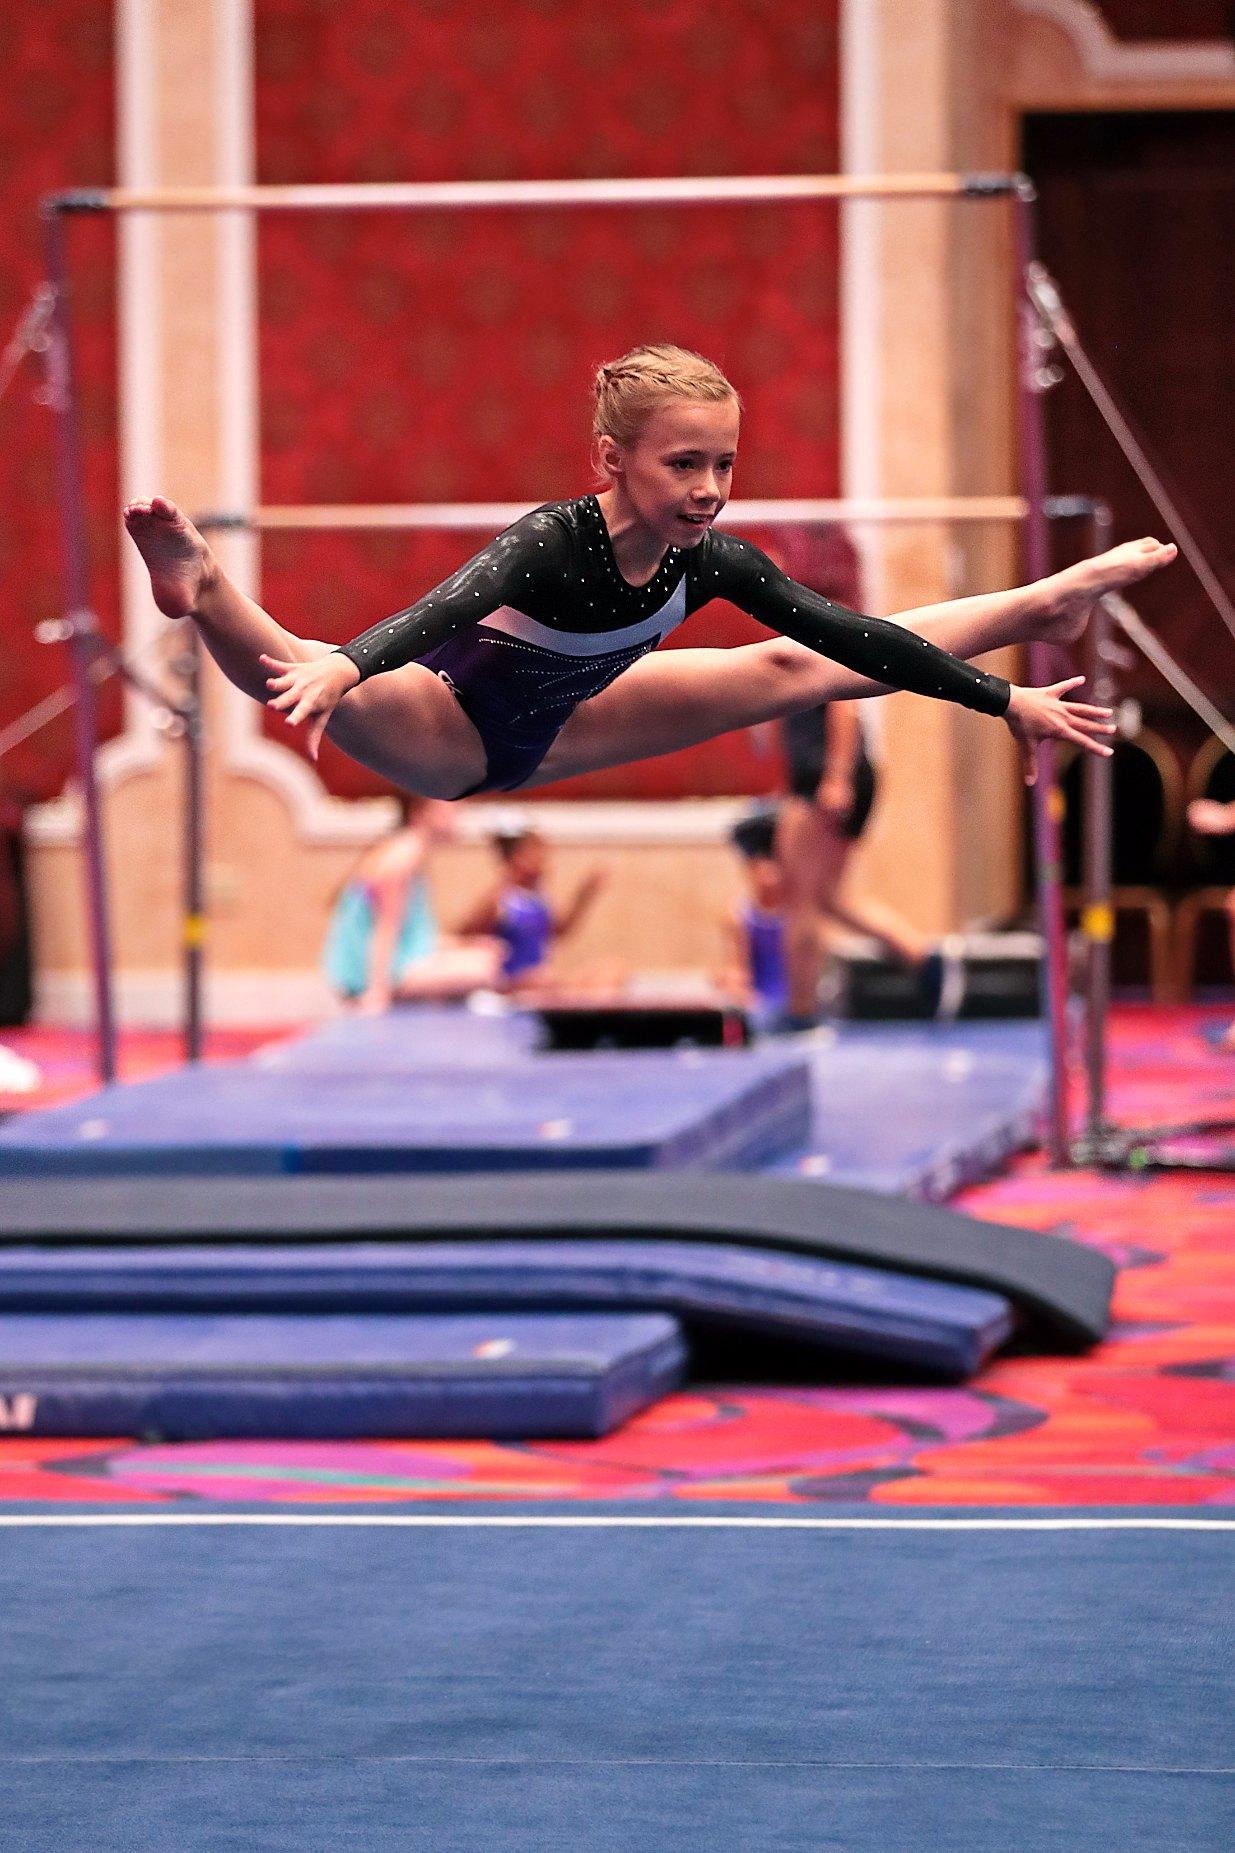 Best Gymnast Ever